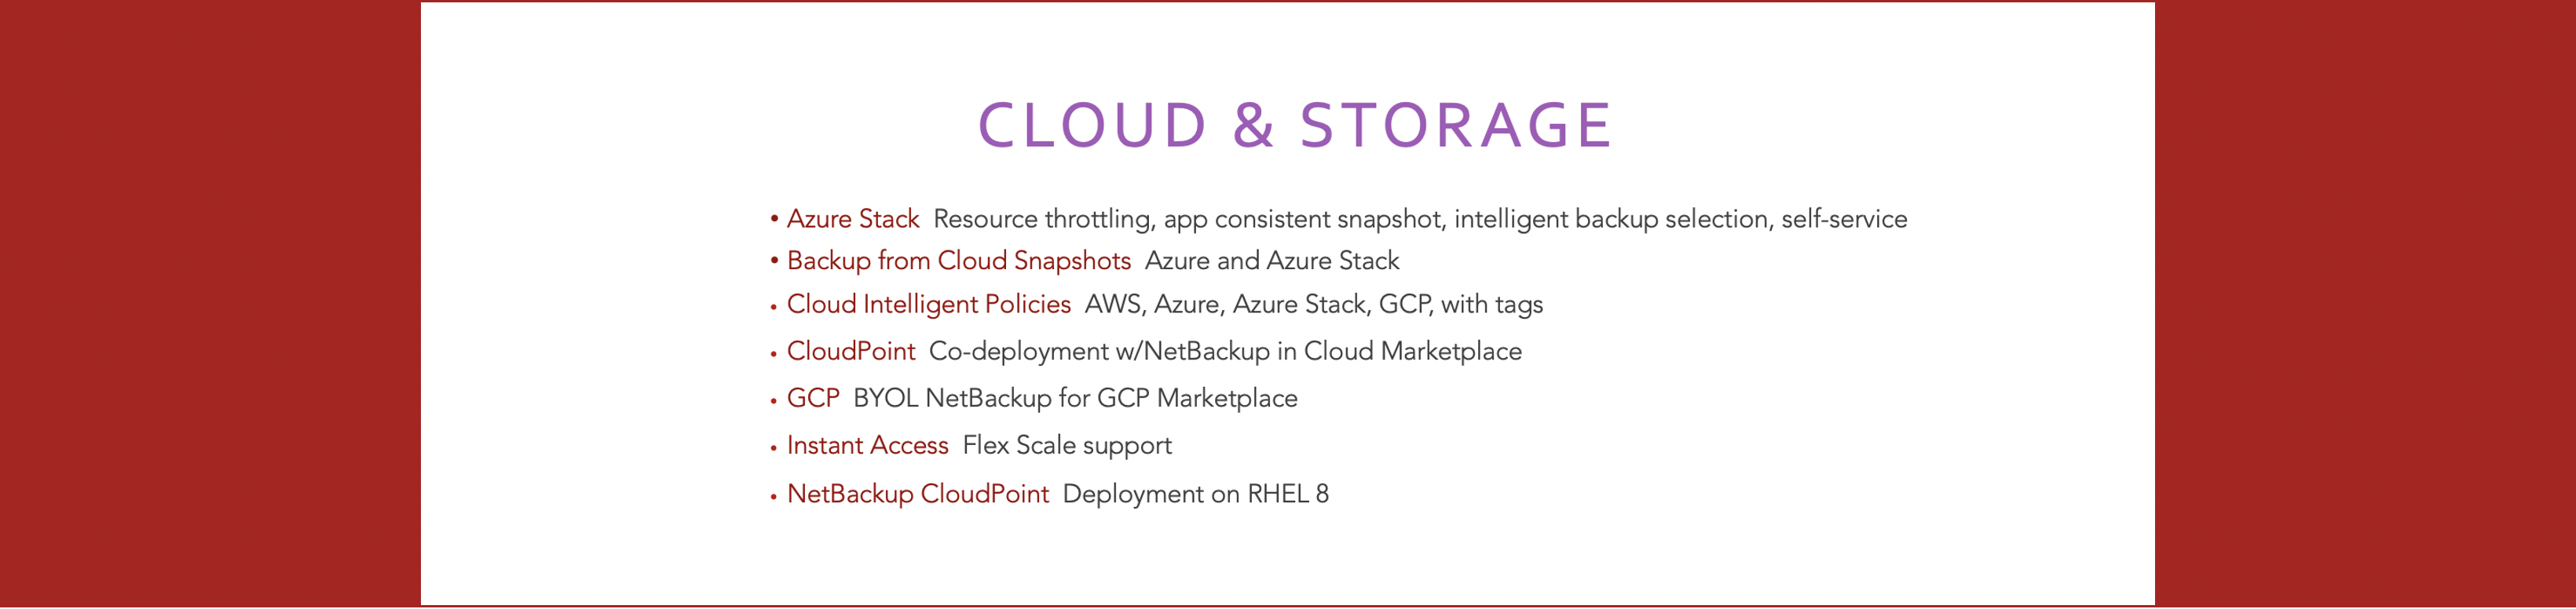 Feature 2 - Cloud & Storage